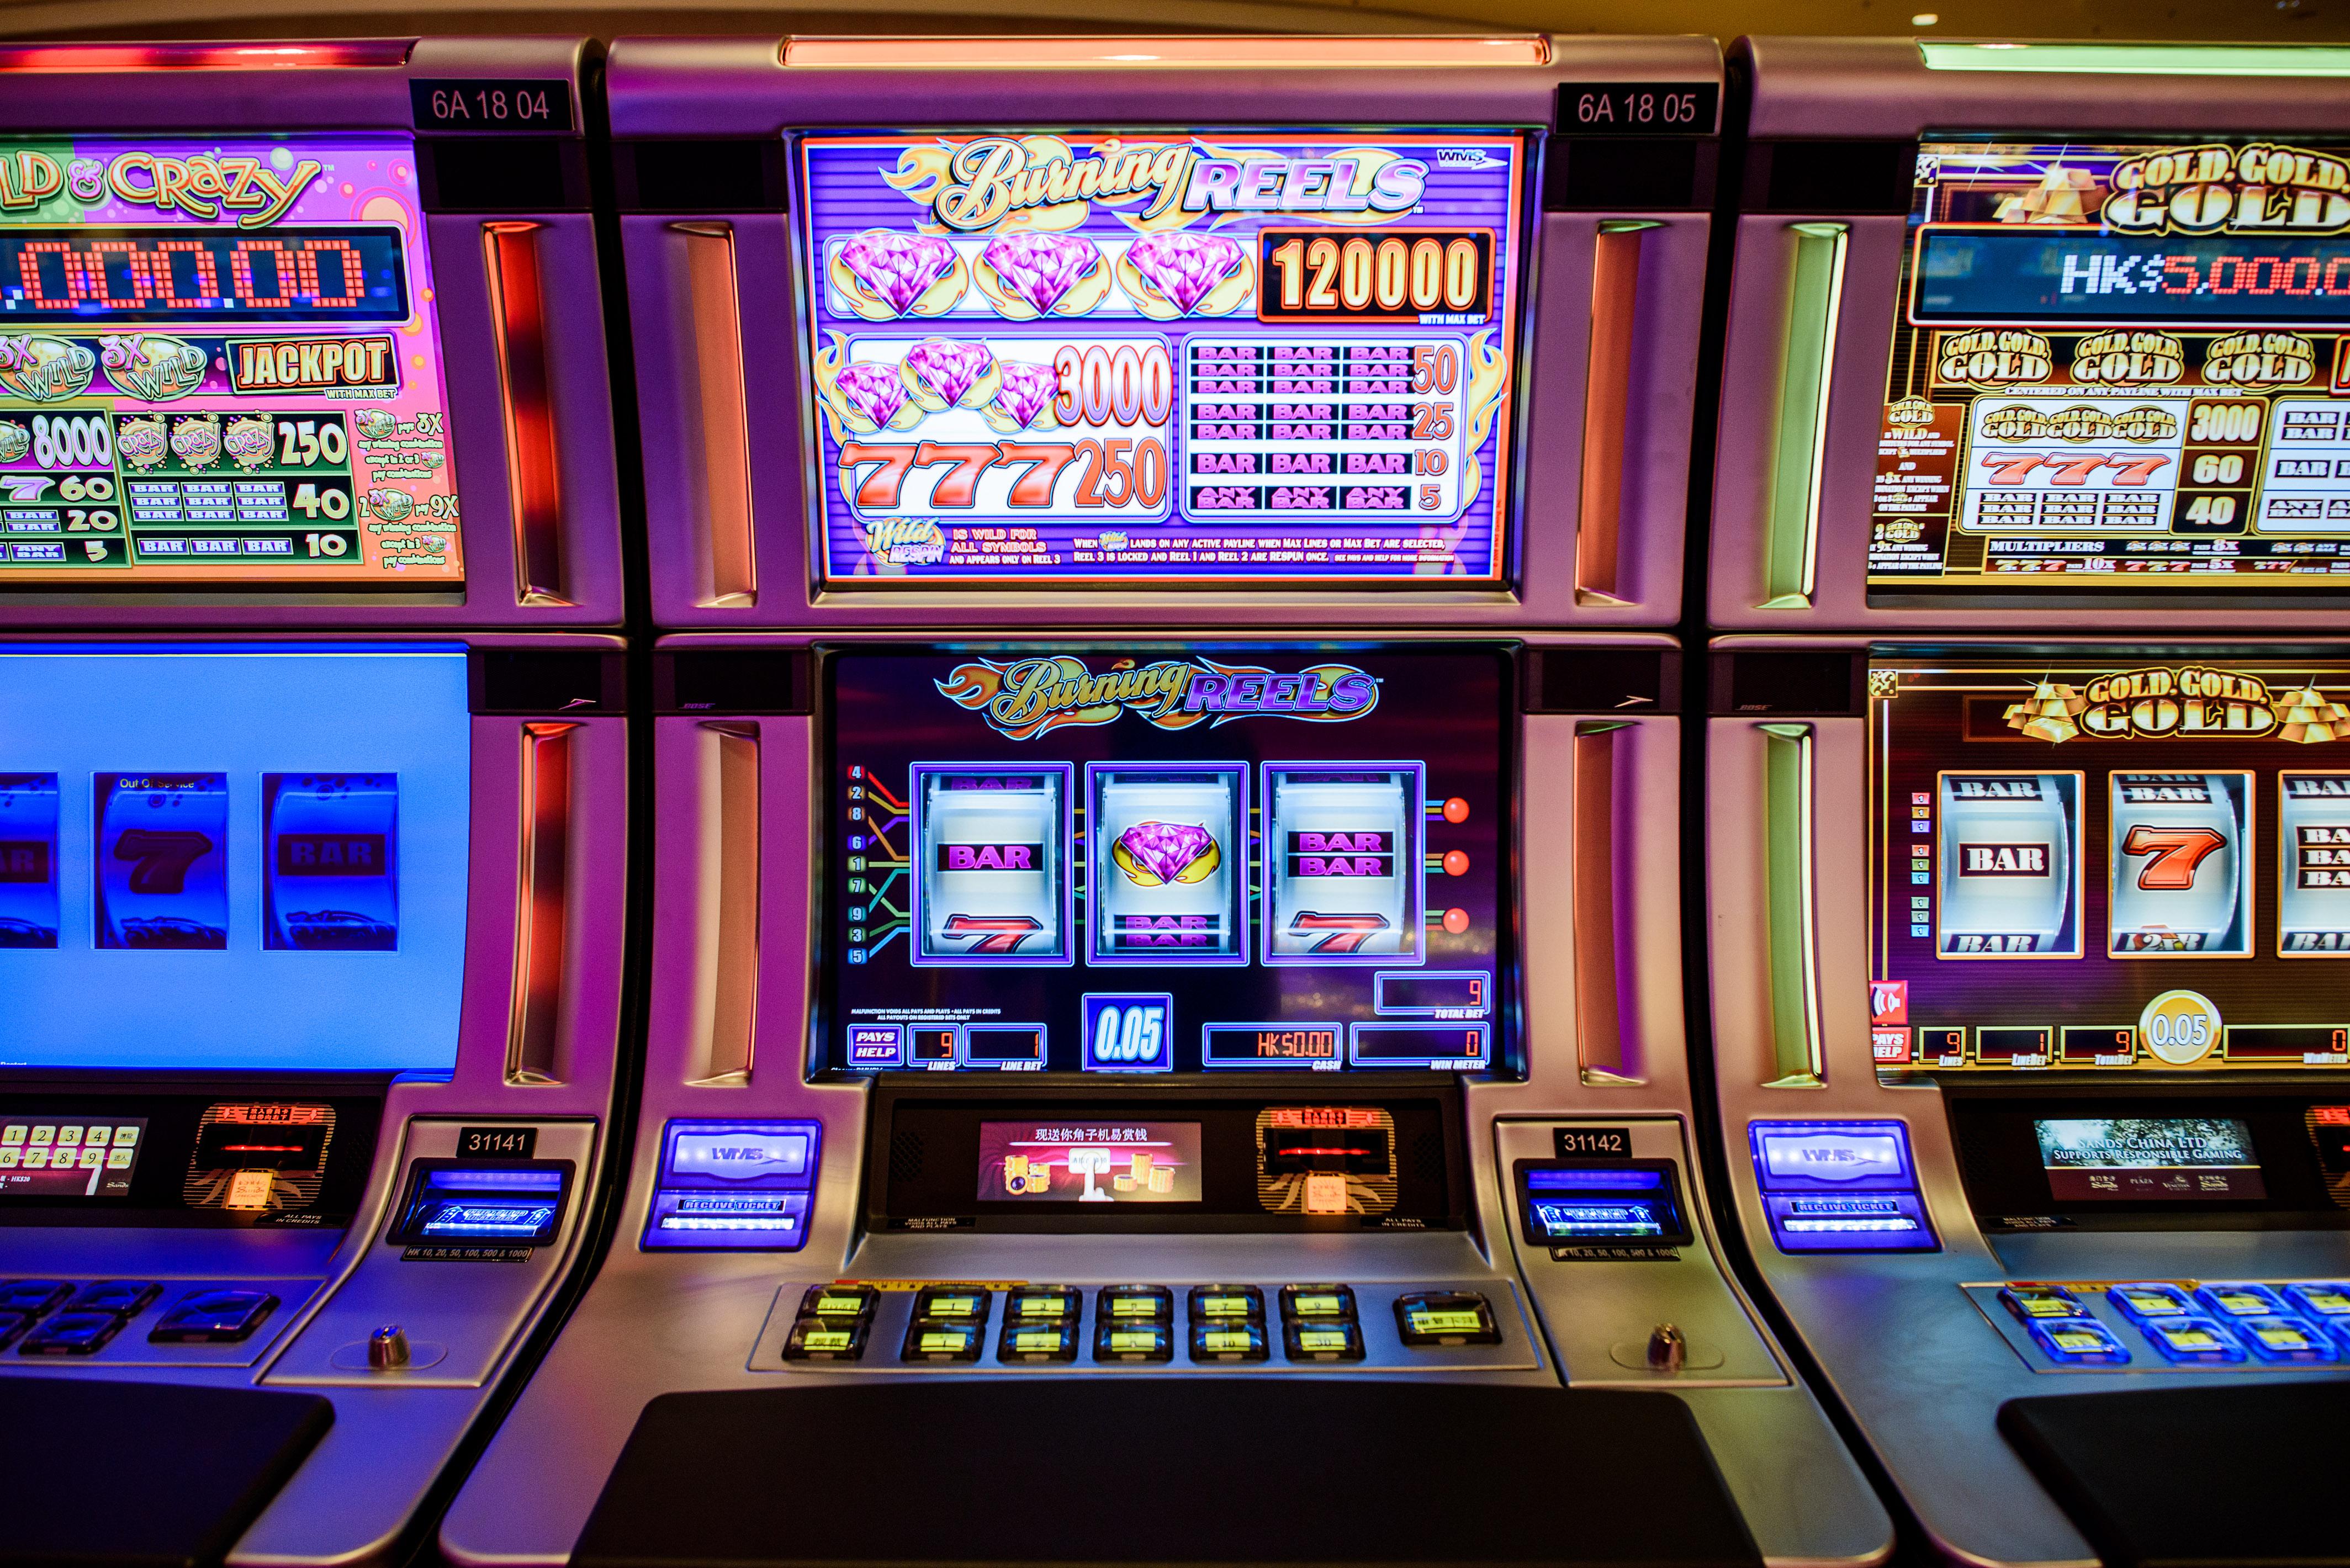 Wiesbaden Casino Jackpot